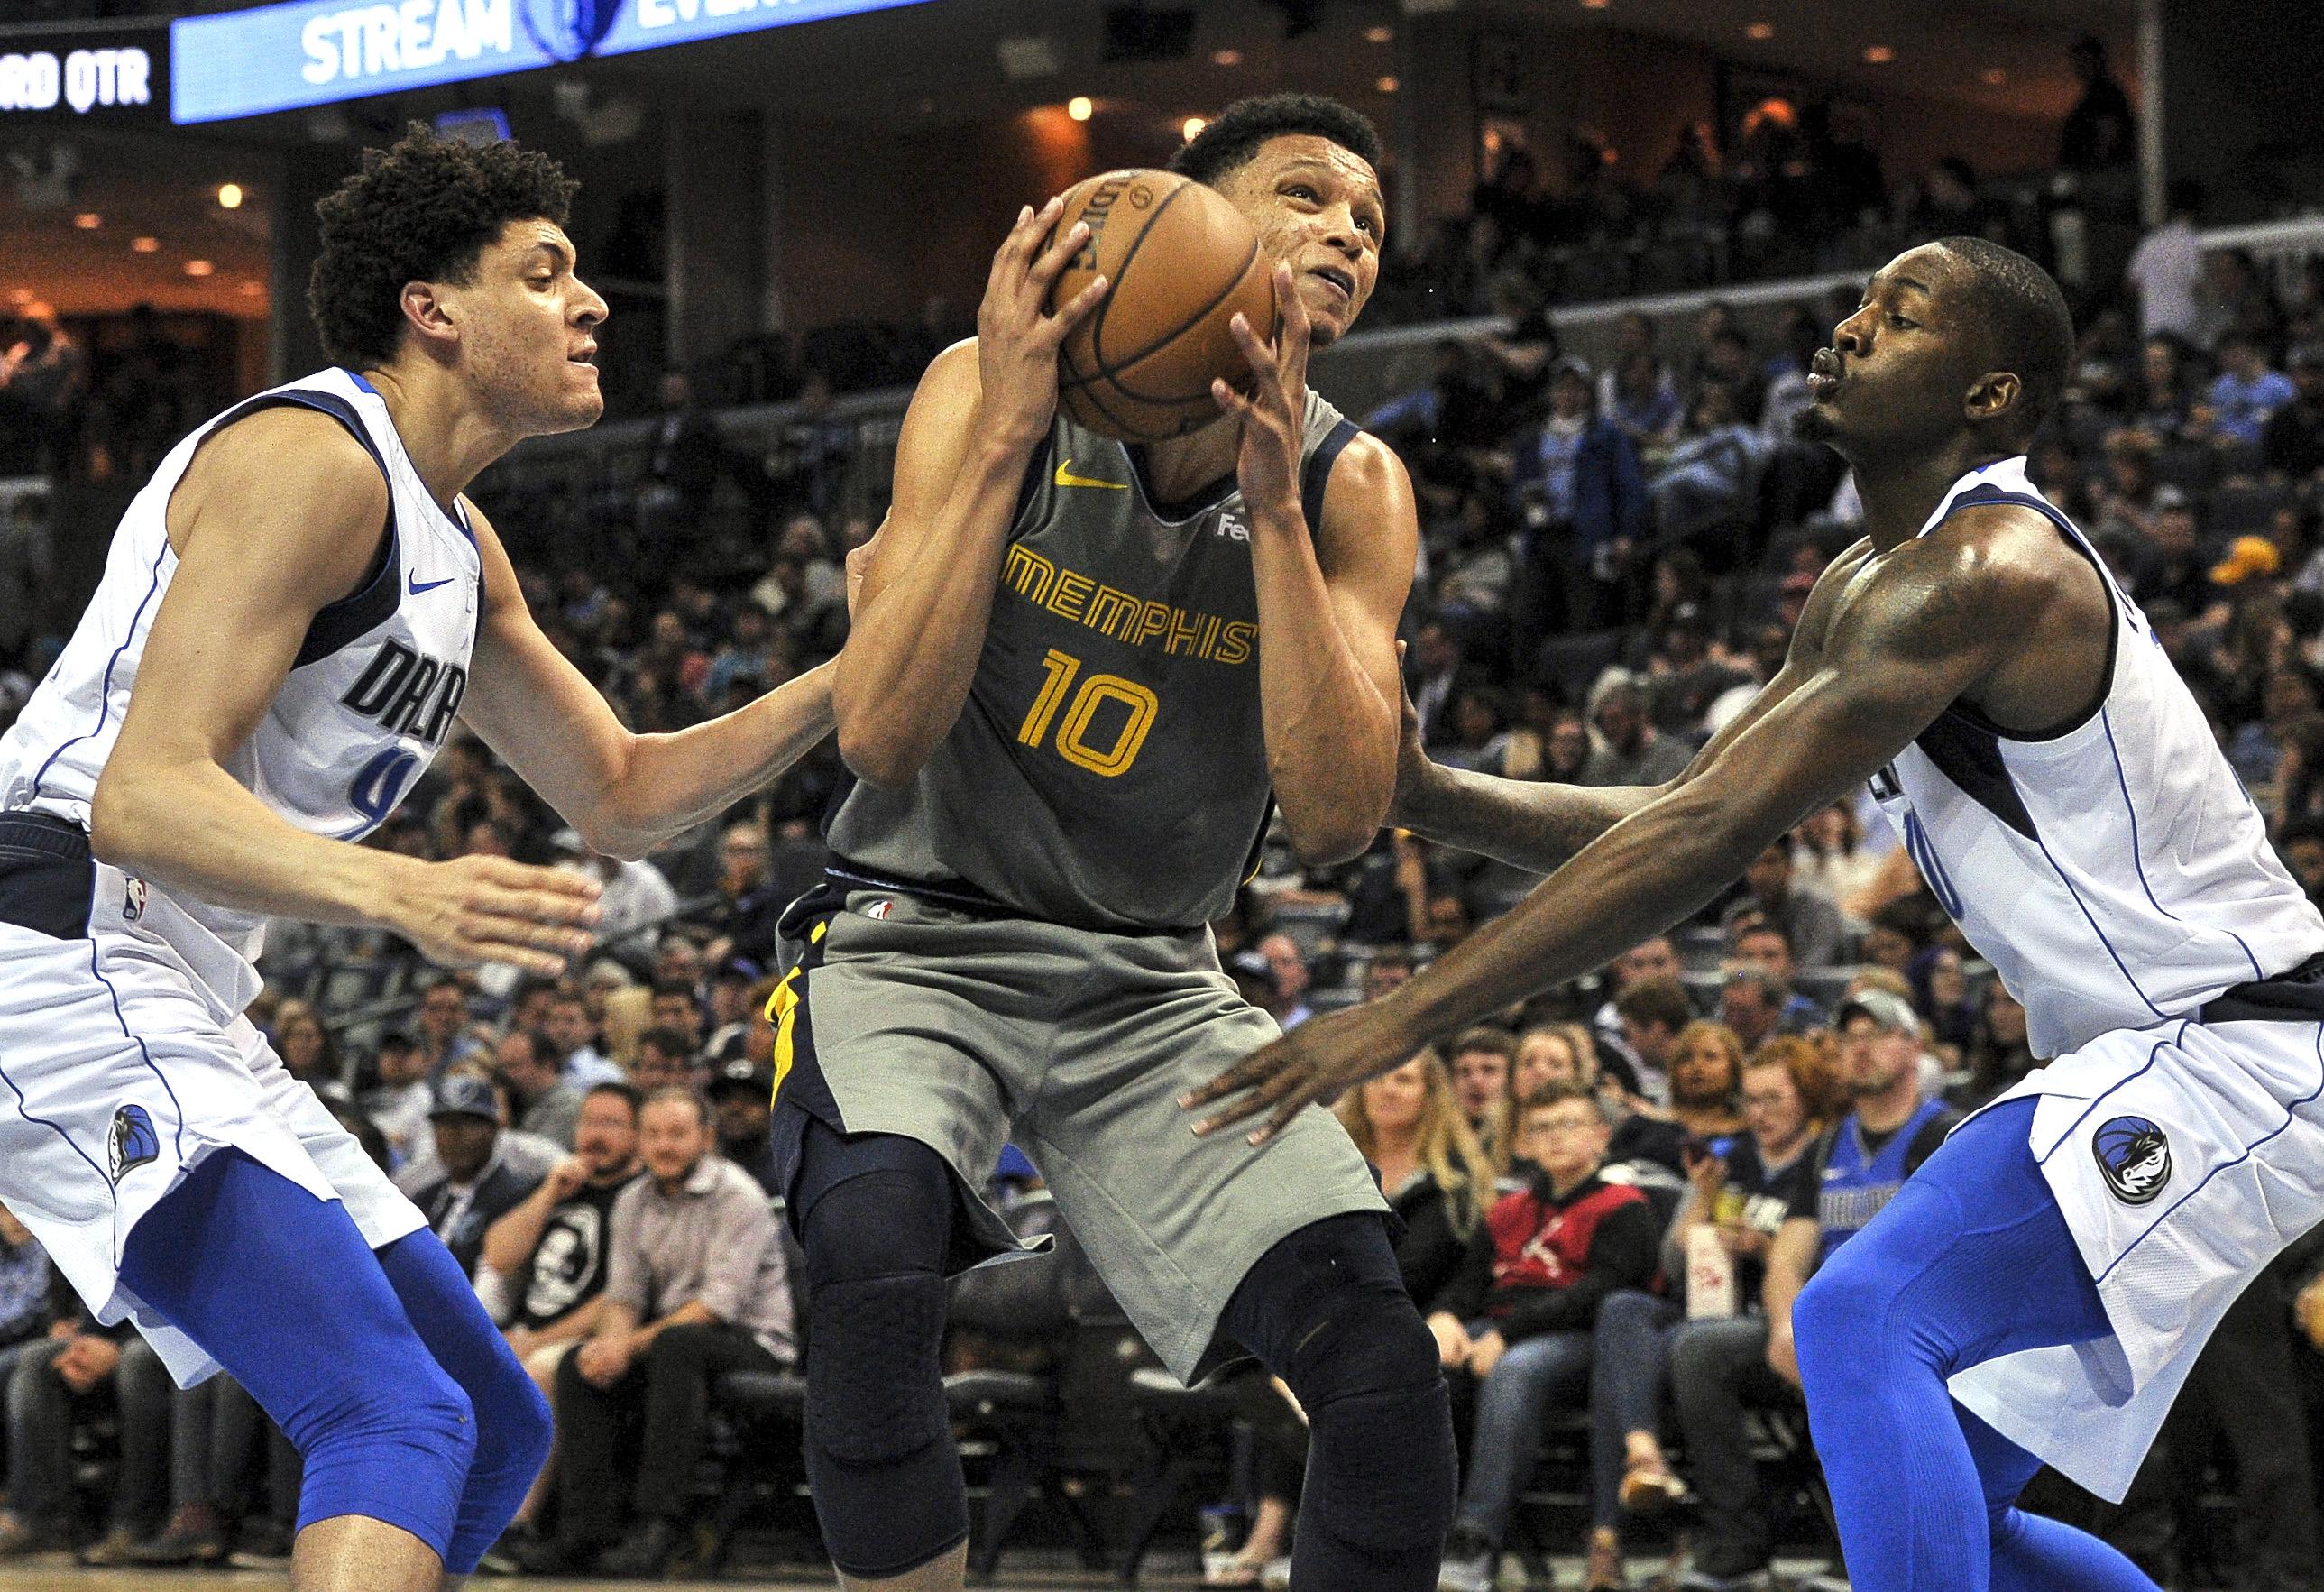 NBA: Dallas Mavericks at Memphis Grizzlies